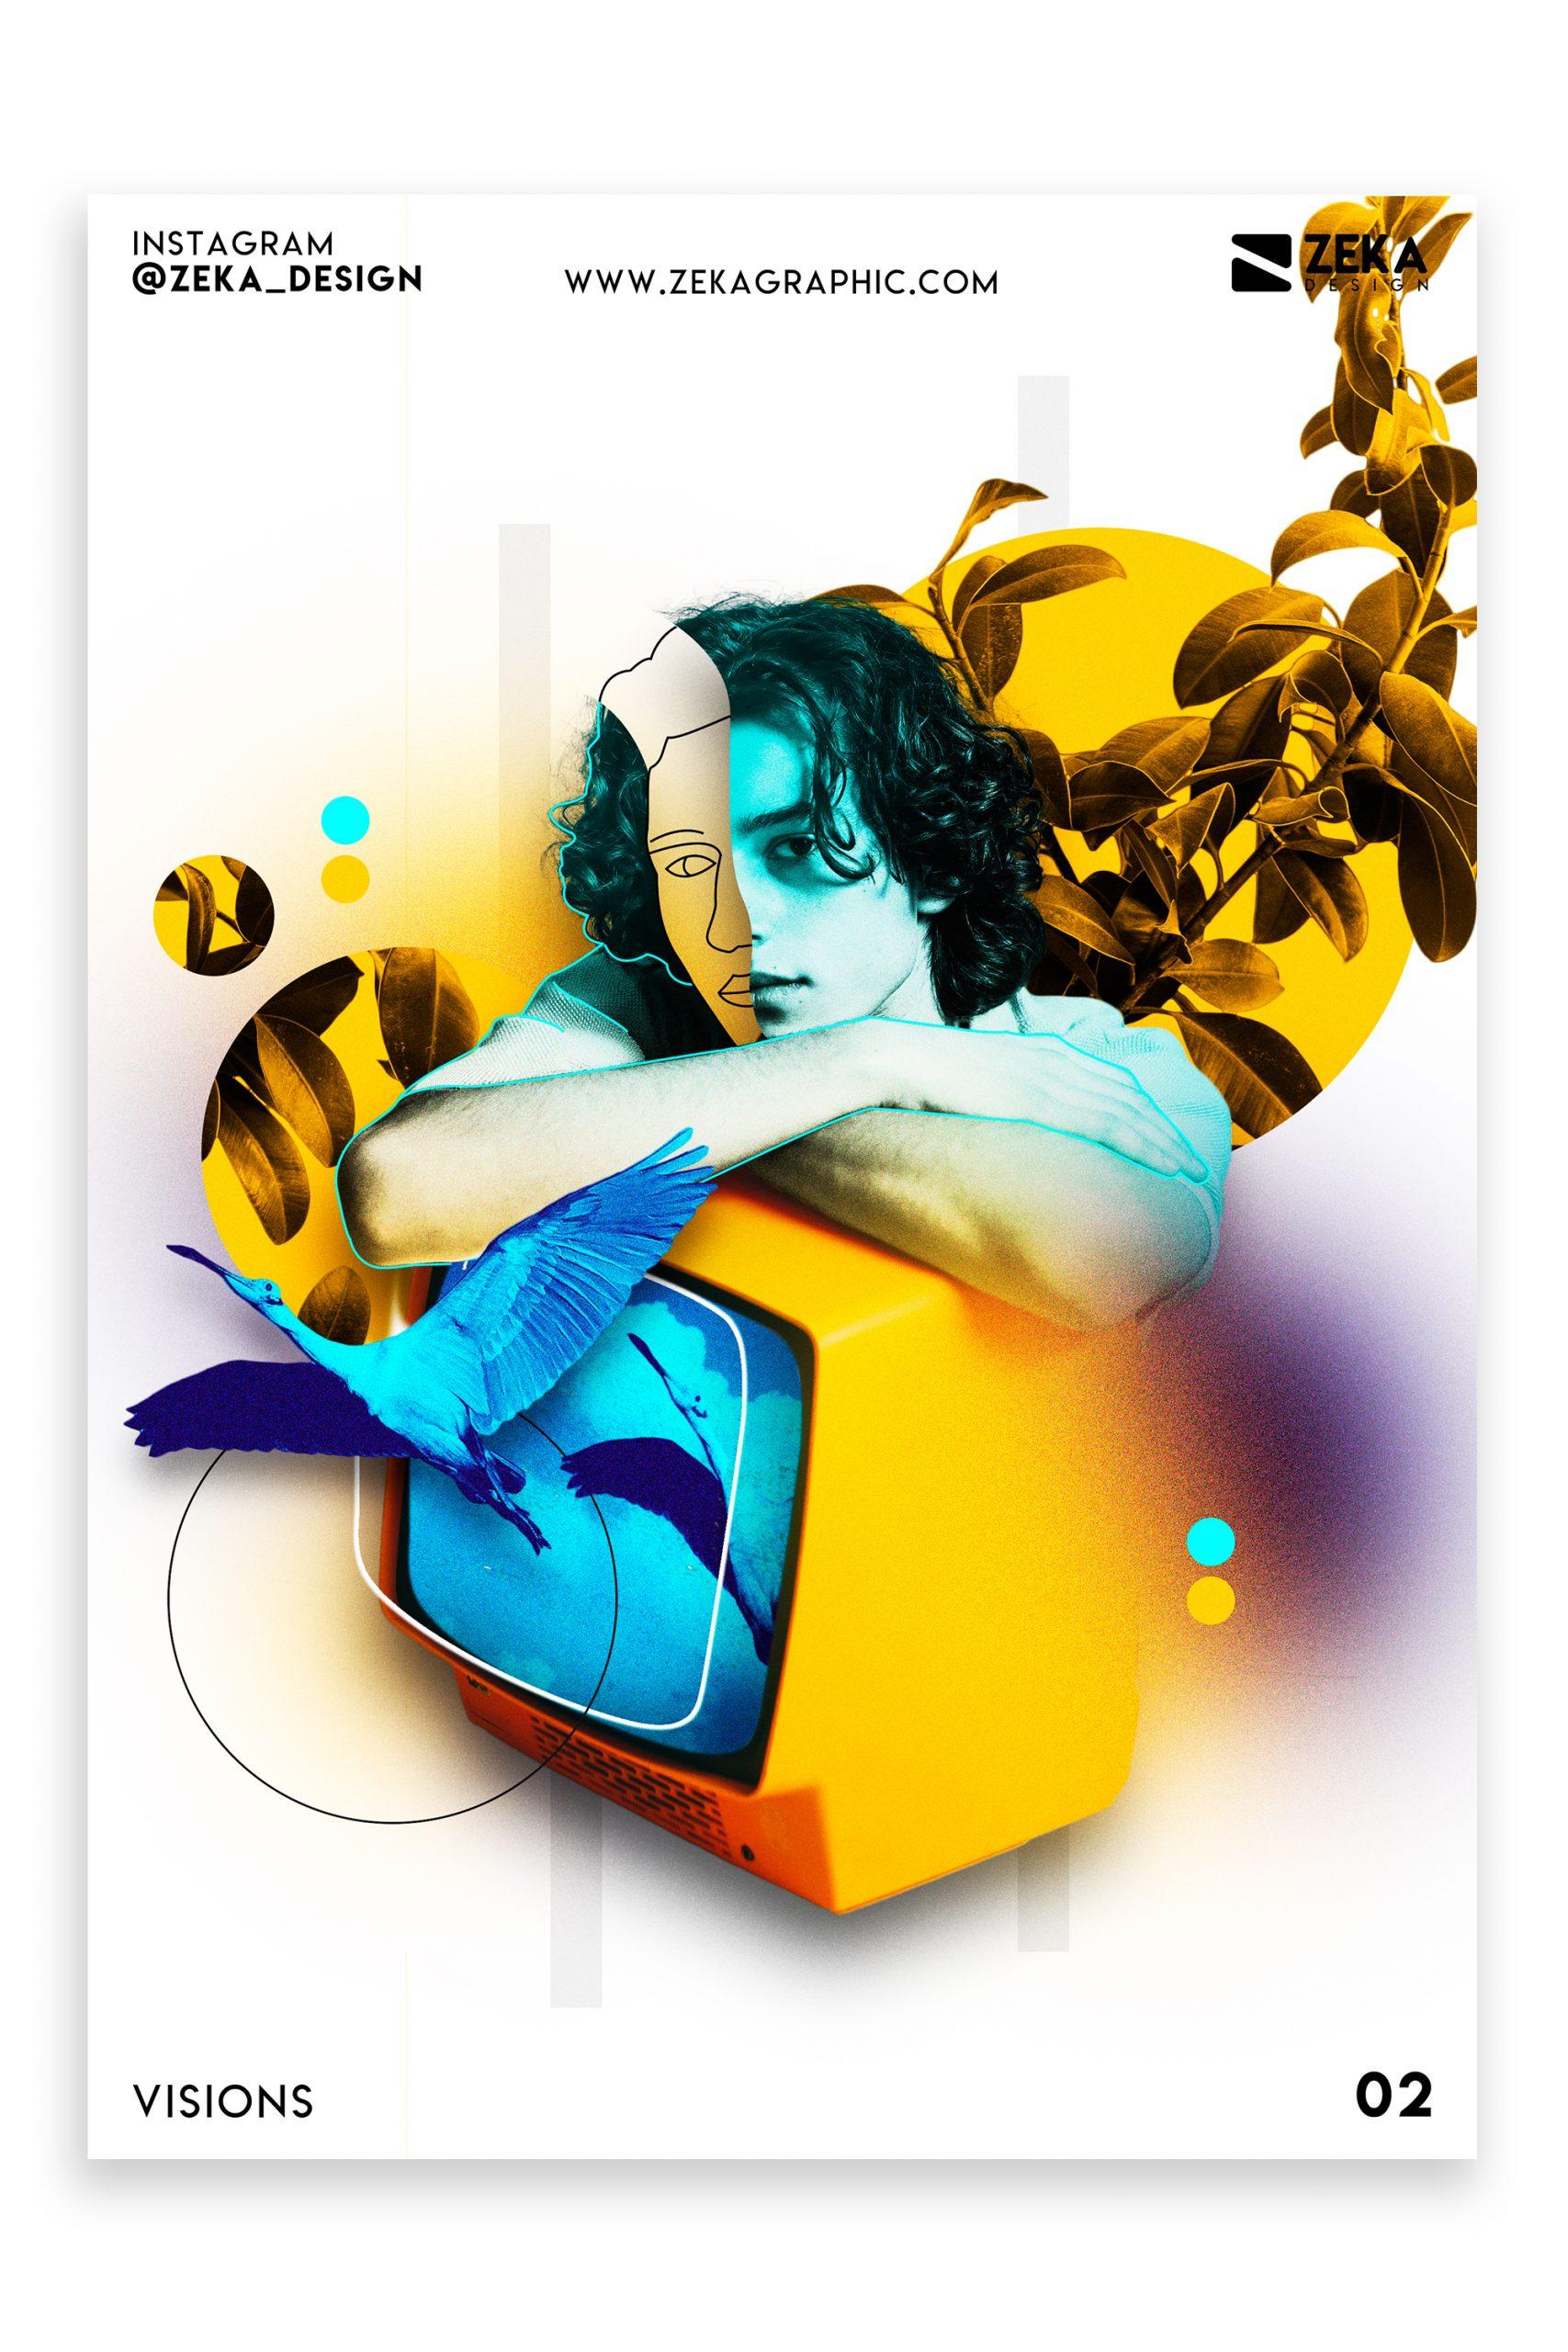 Visions Poster Design Inspiration Zeka Design Graphic Design Portfolio 2